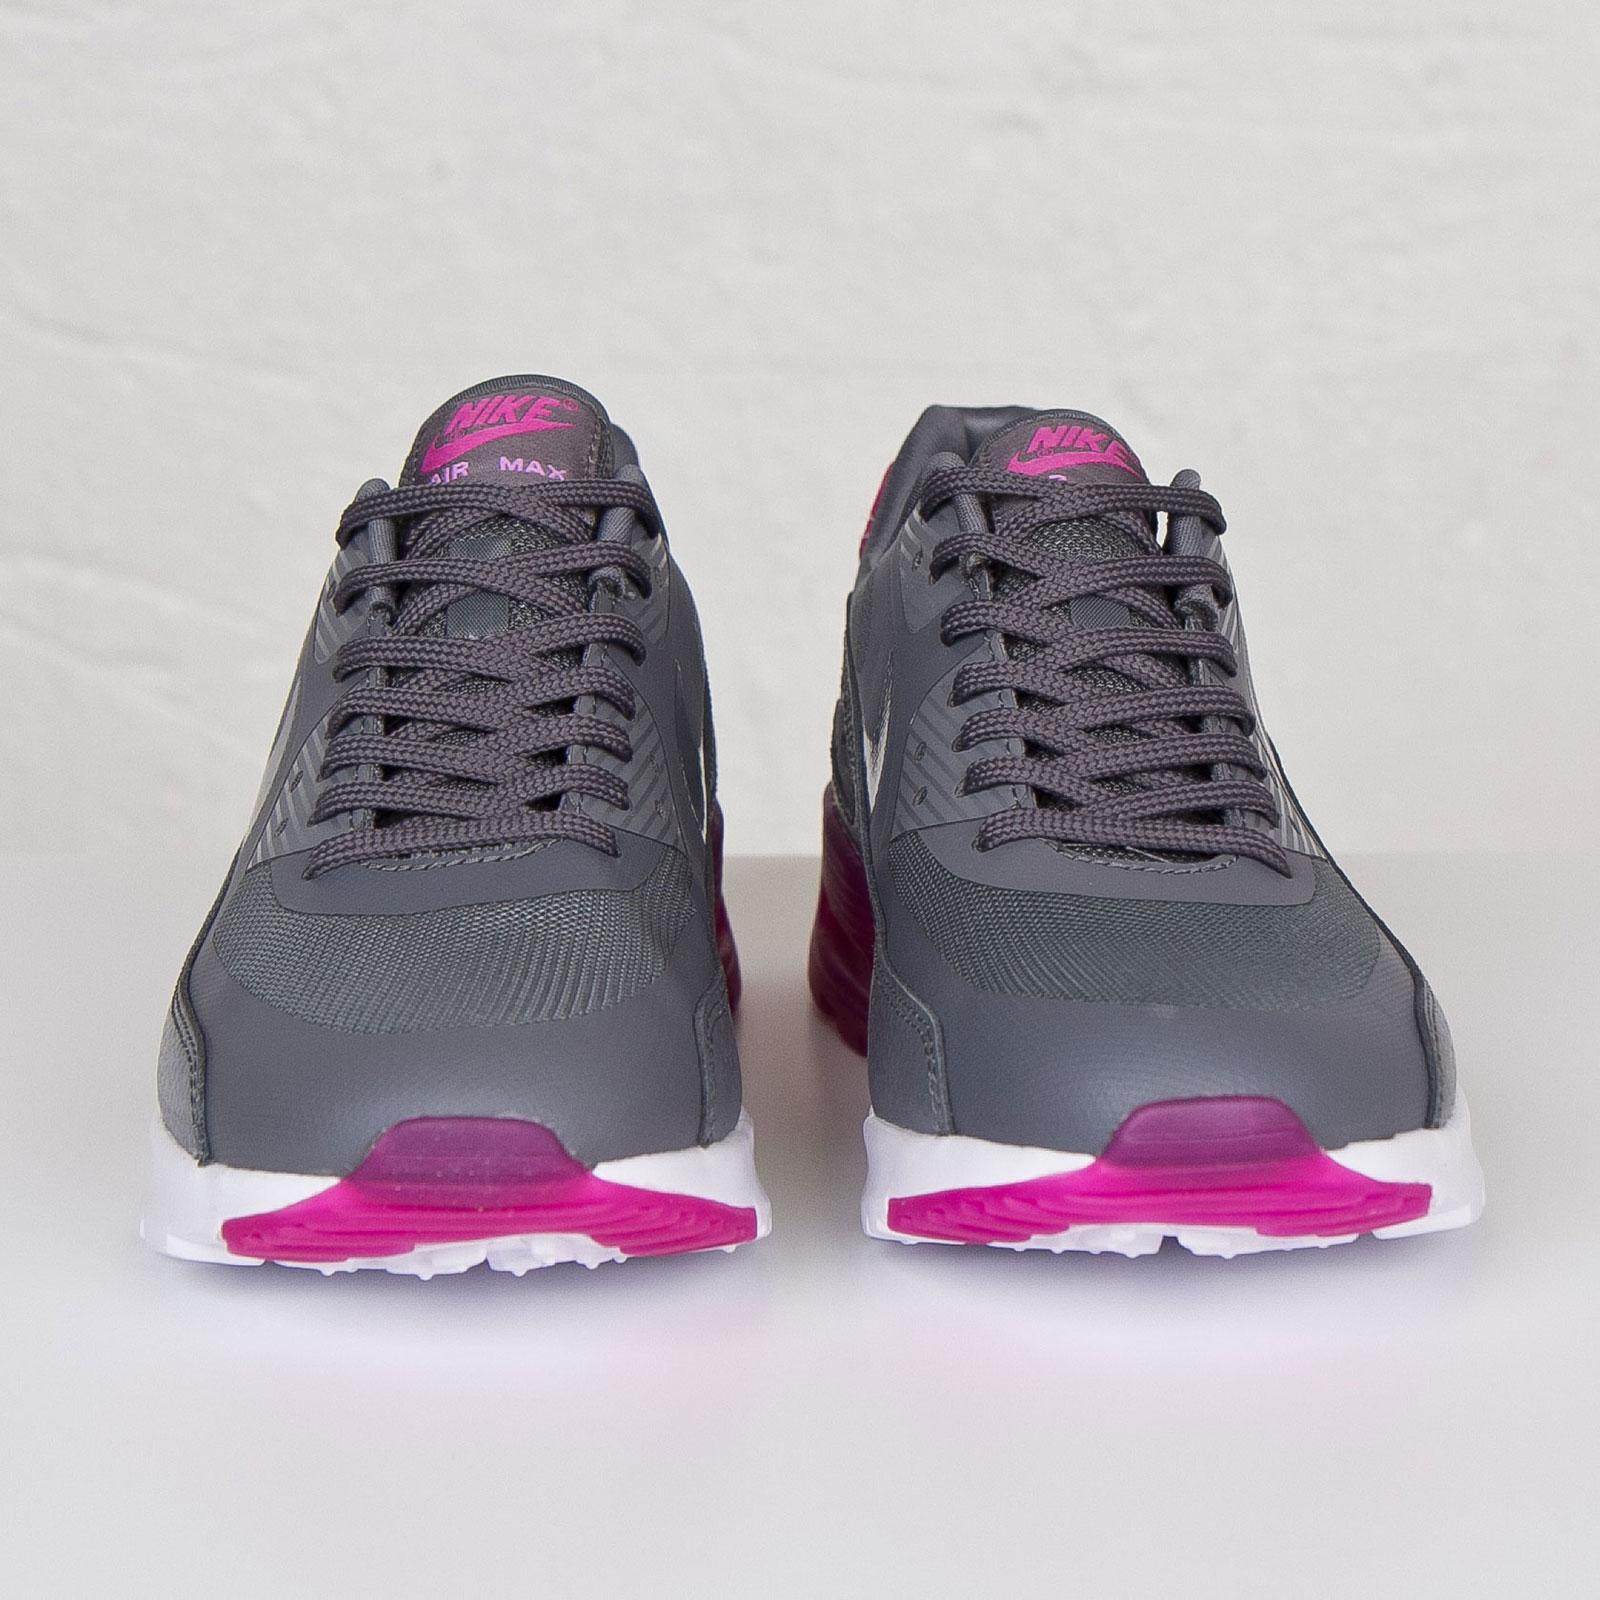 new product 3fa35 85e52 Nike Women s Air Max 90 Ultra Essential - Cool Grey   Fuchsia Flash - Air  23 - Air Jordan Release Dates, Foamposite, Air Max, and More